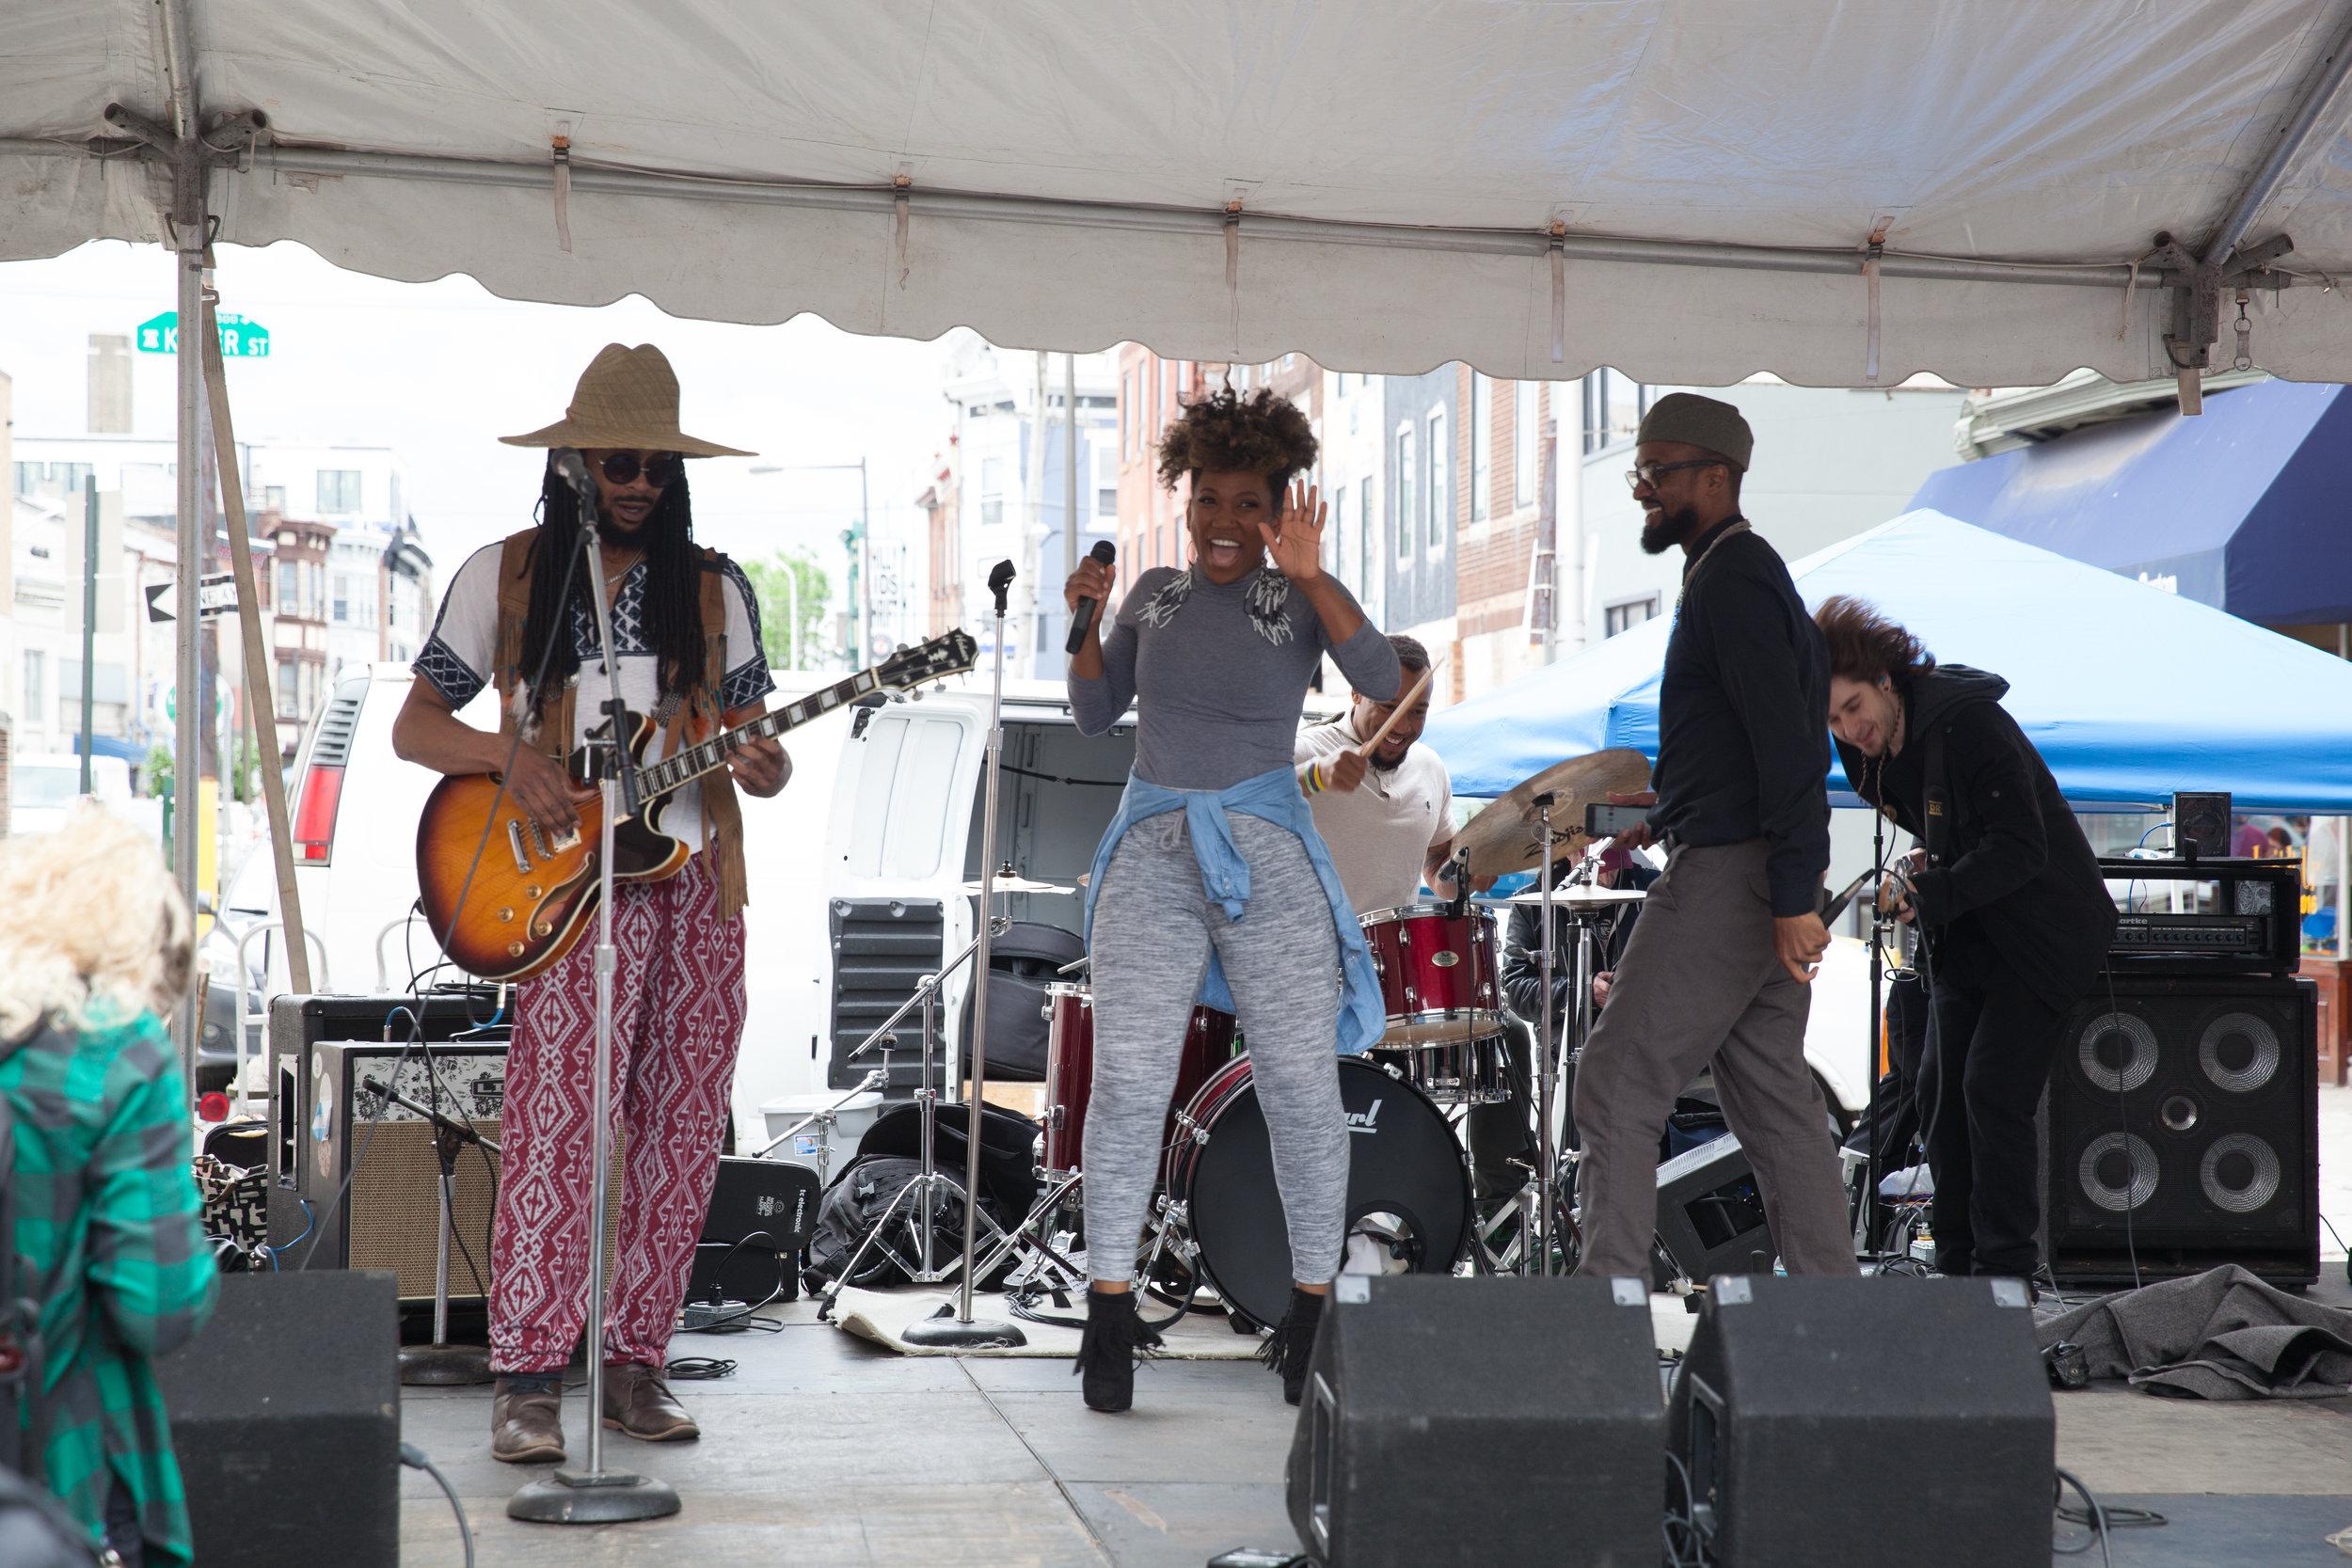 South Street Spring Fest, Johnny Popcorn, Fifth street stage